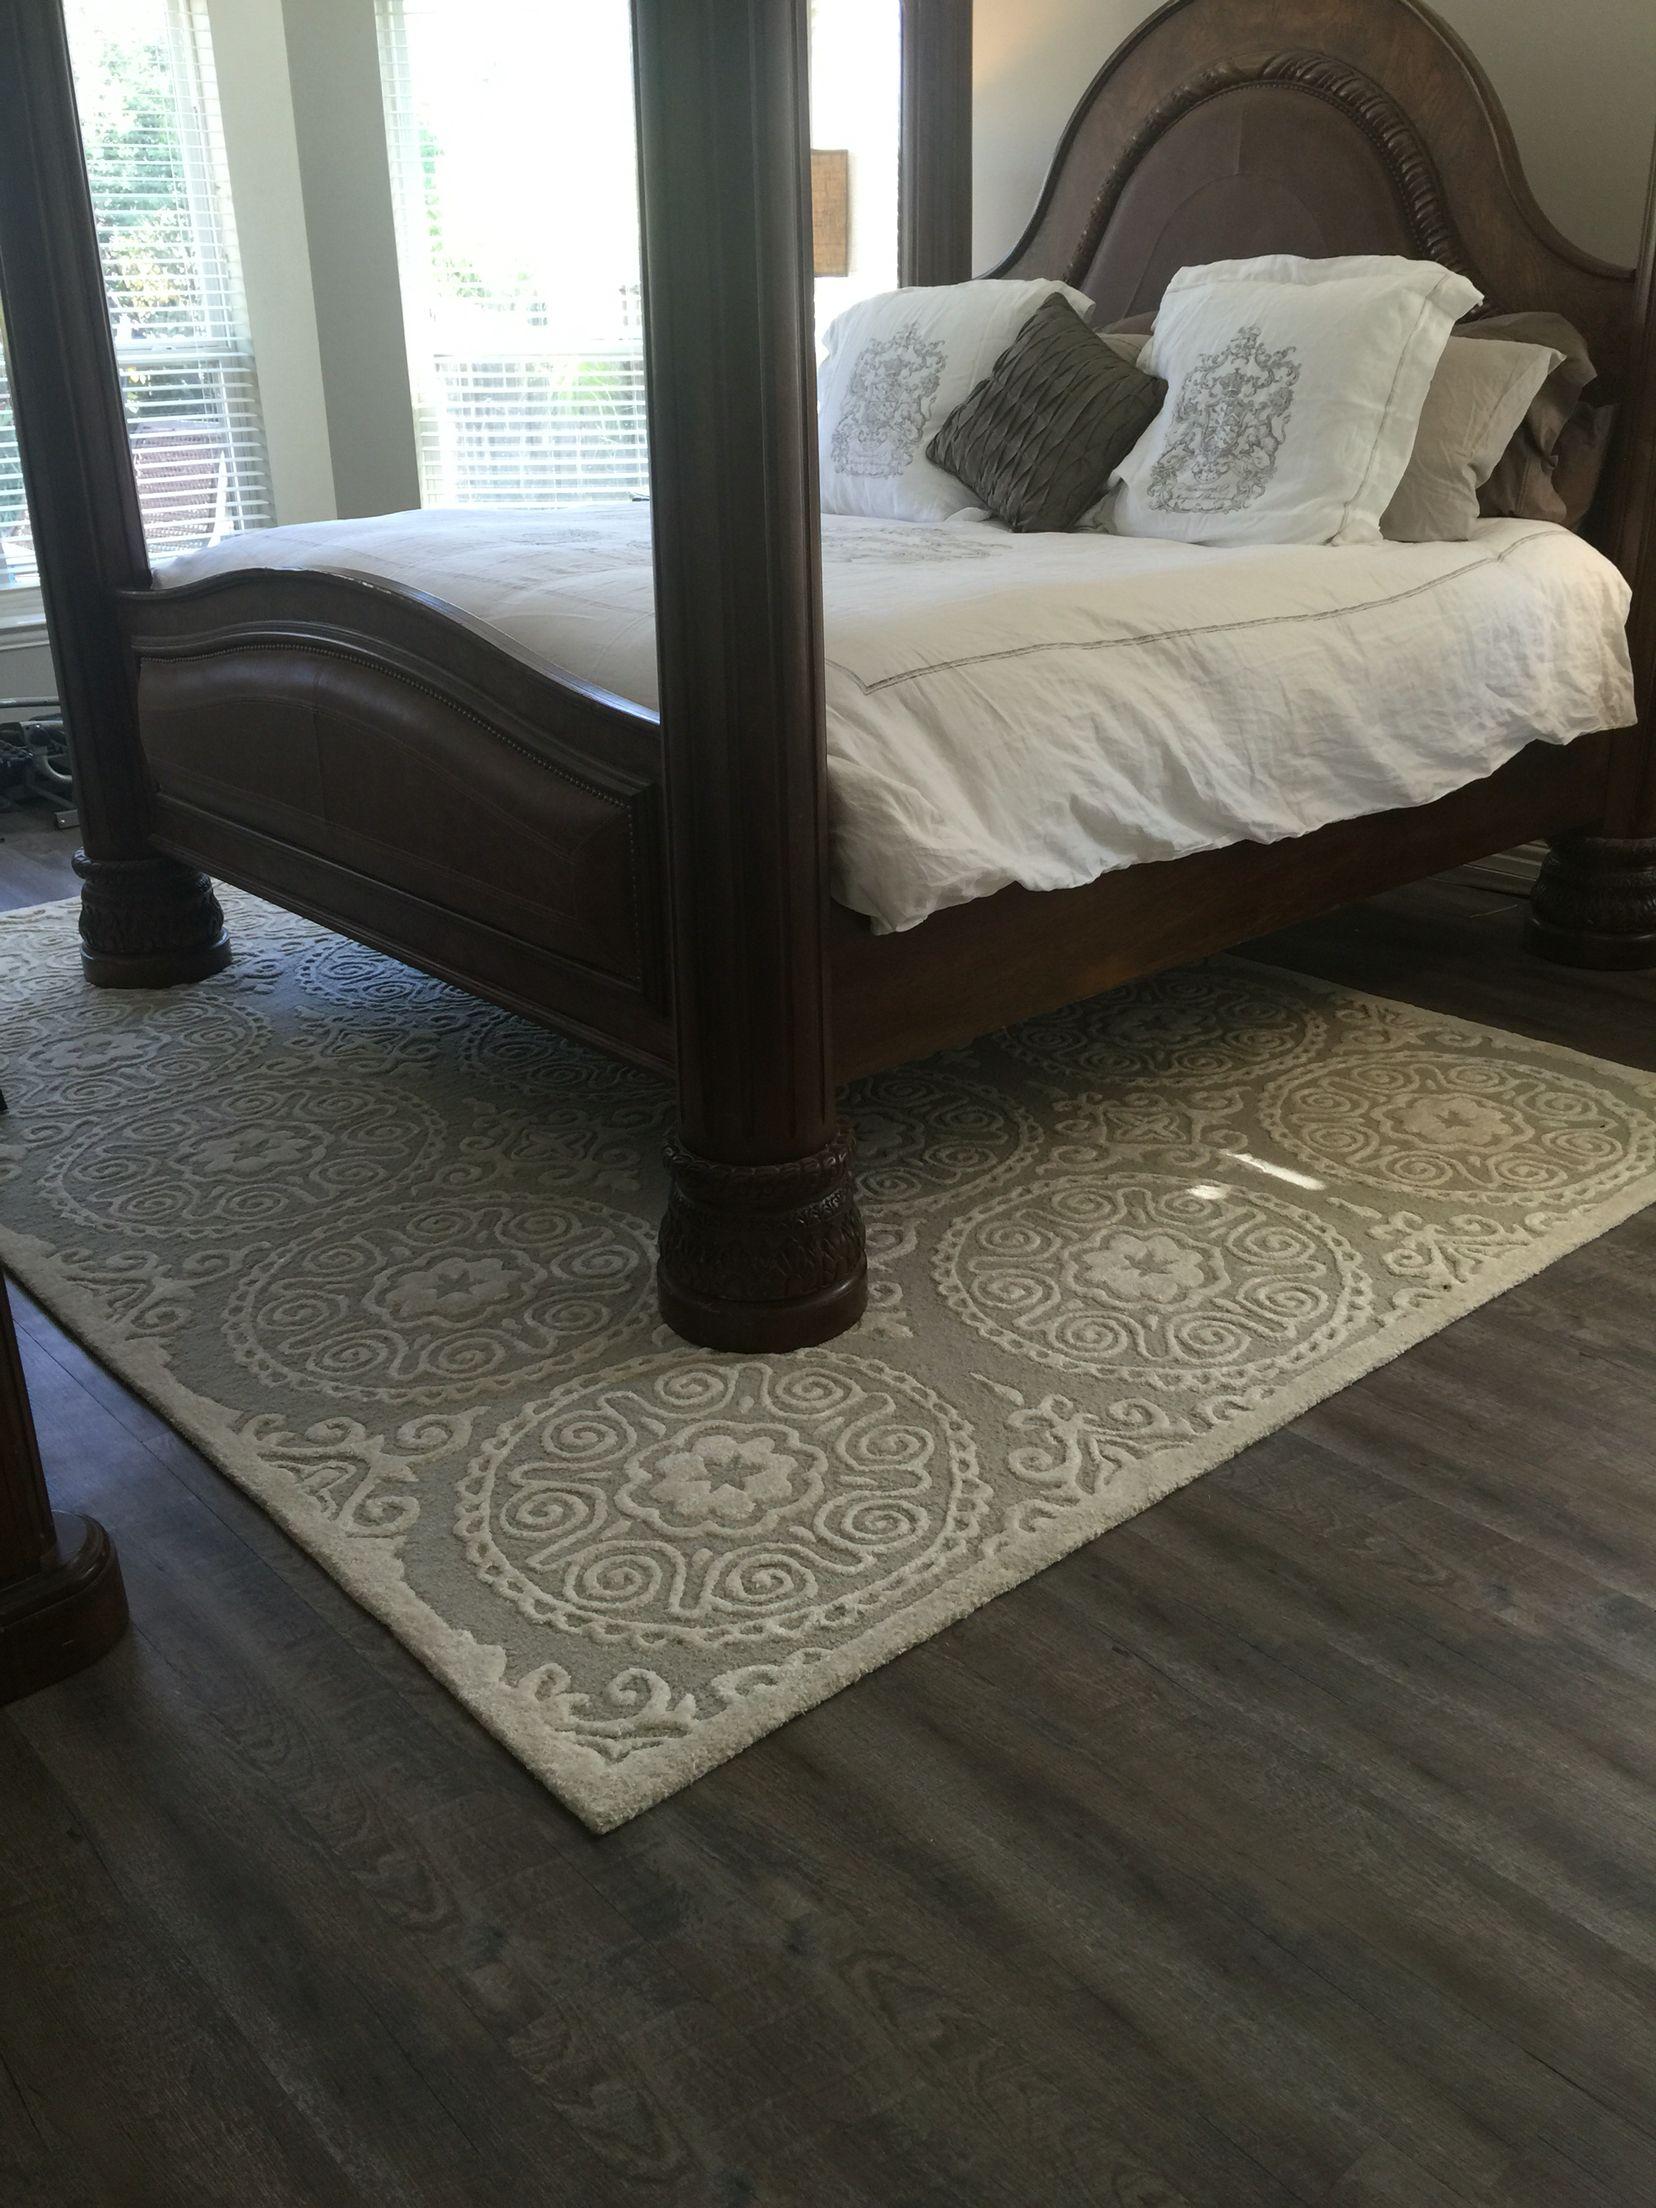 Peel and stick vinyl Driftwood flooring in master bedroom